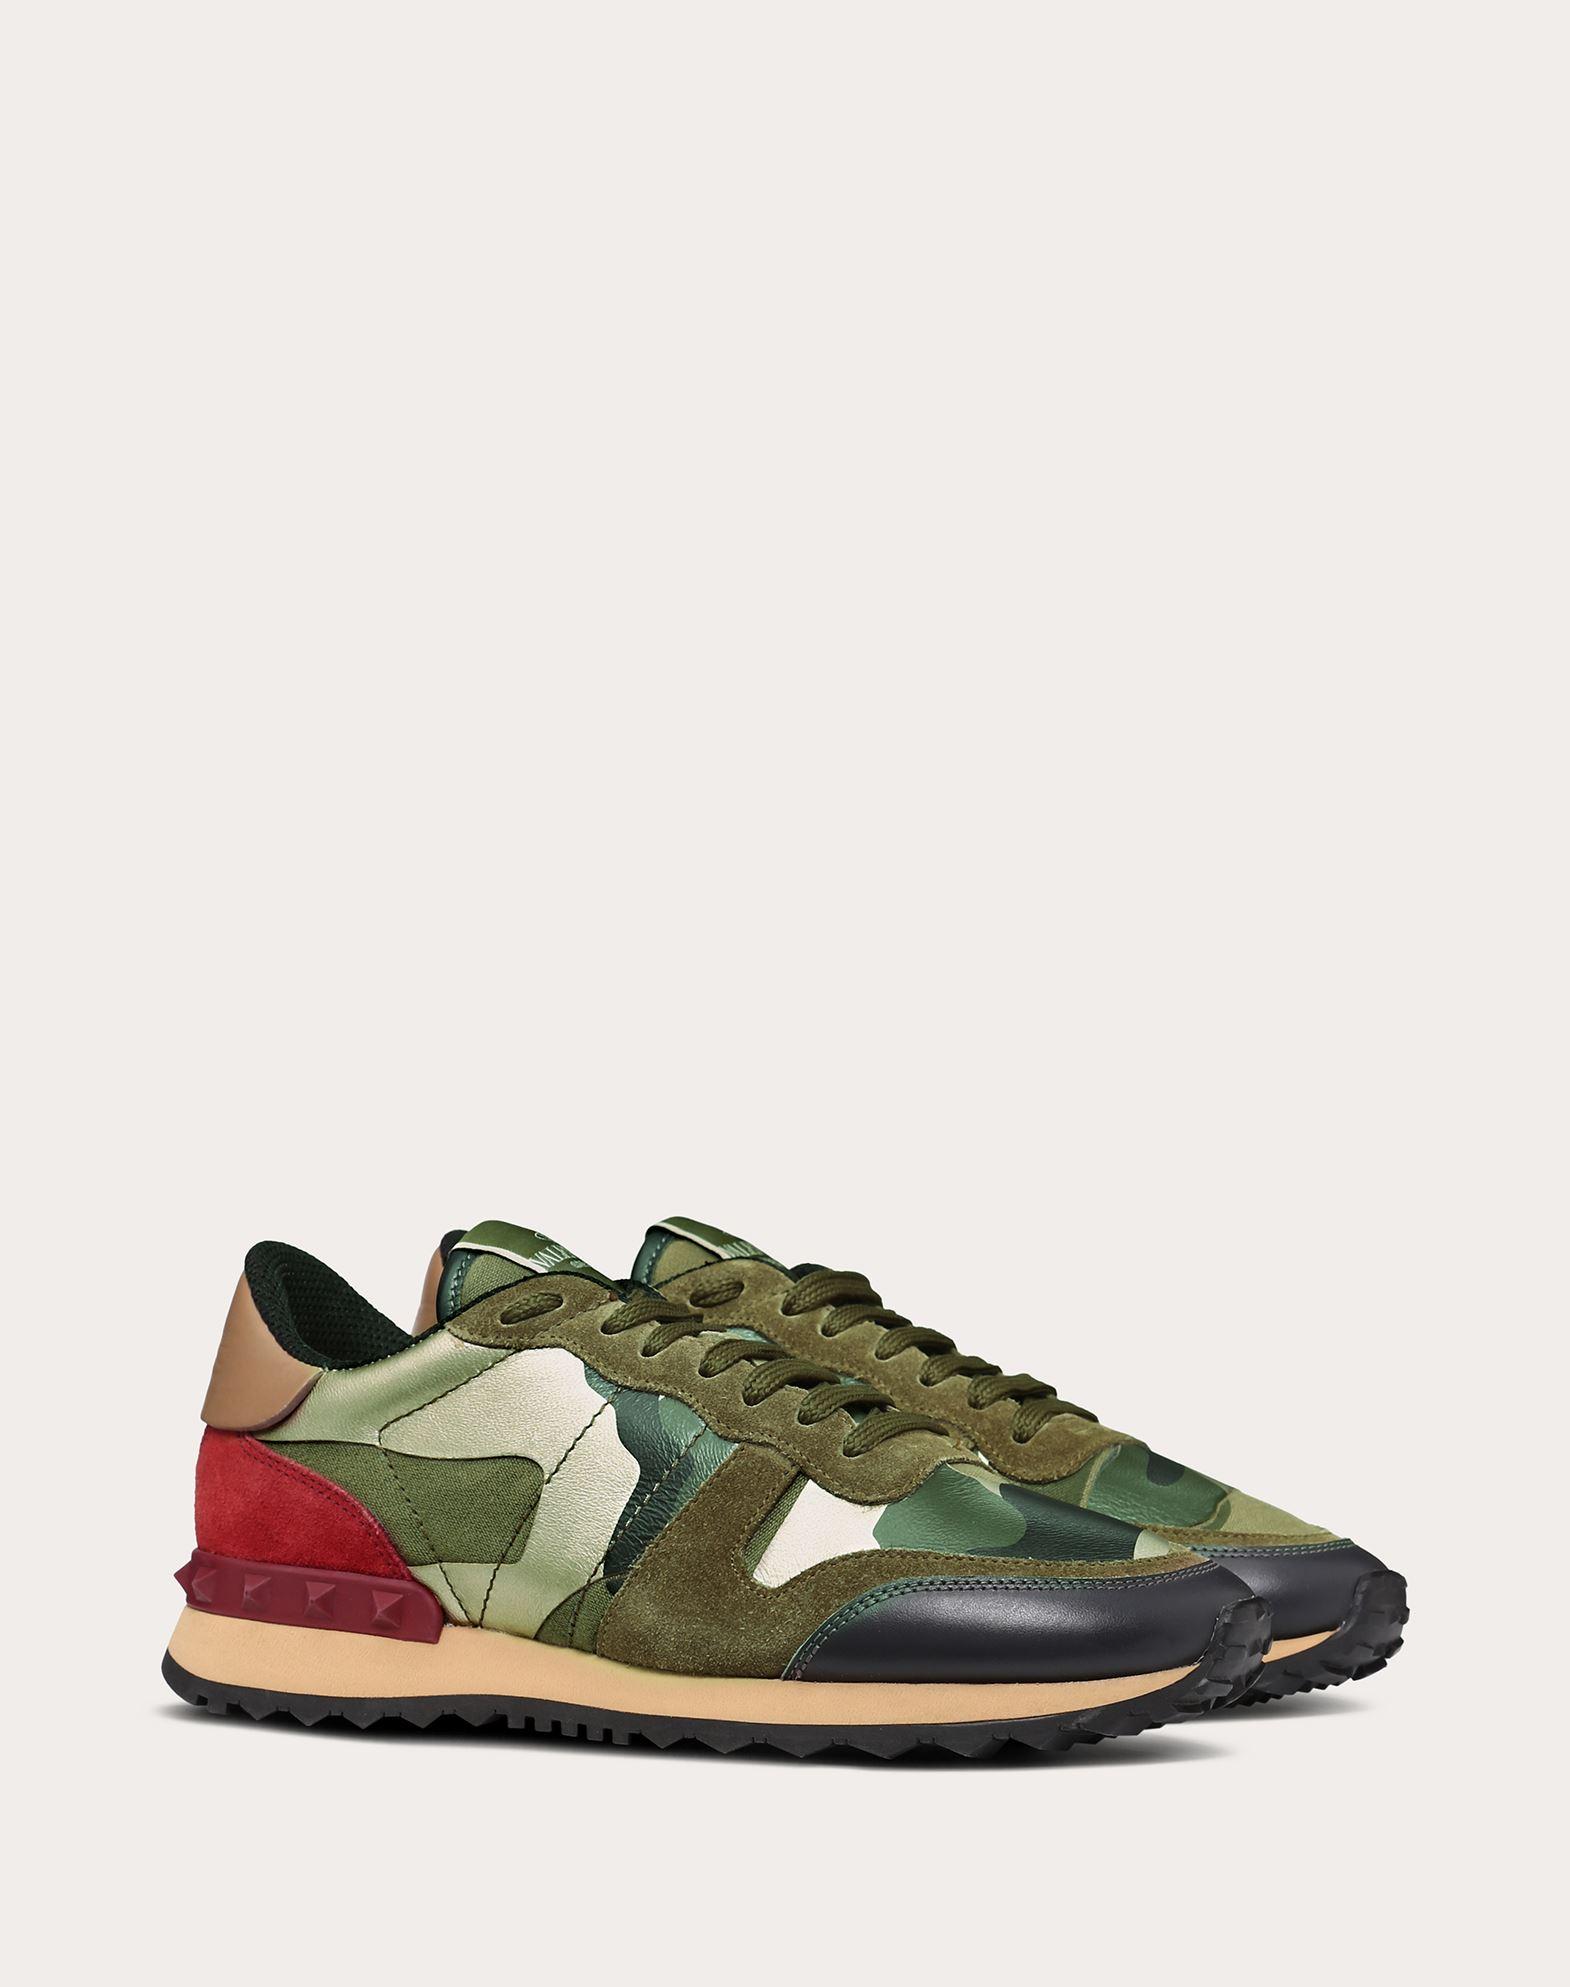 VALENTINO GARAVANI Camouflage sneaker LOW-TOP SNEAKERS D r